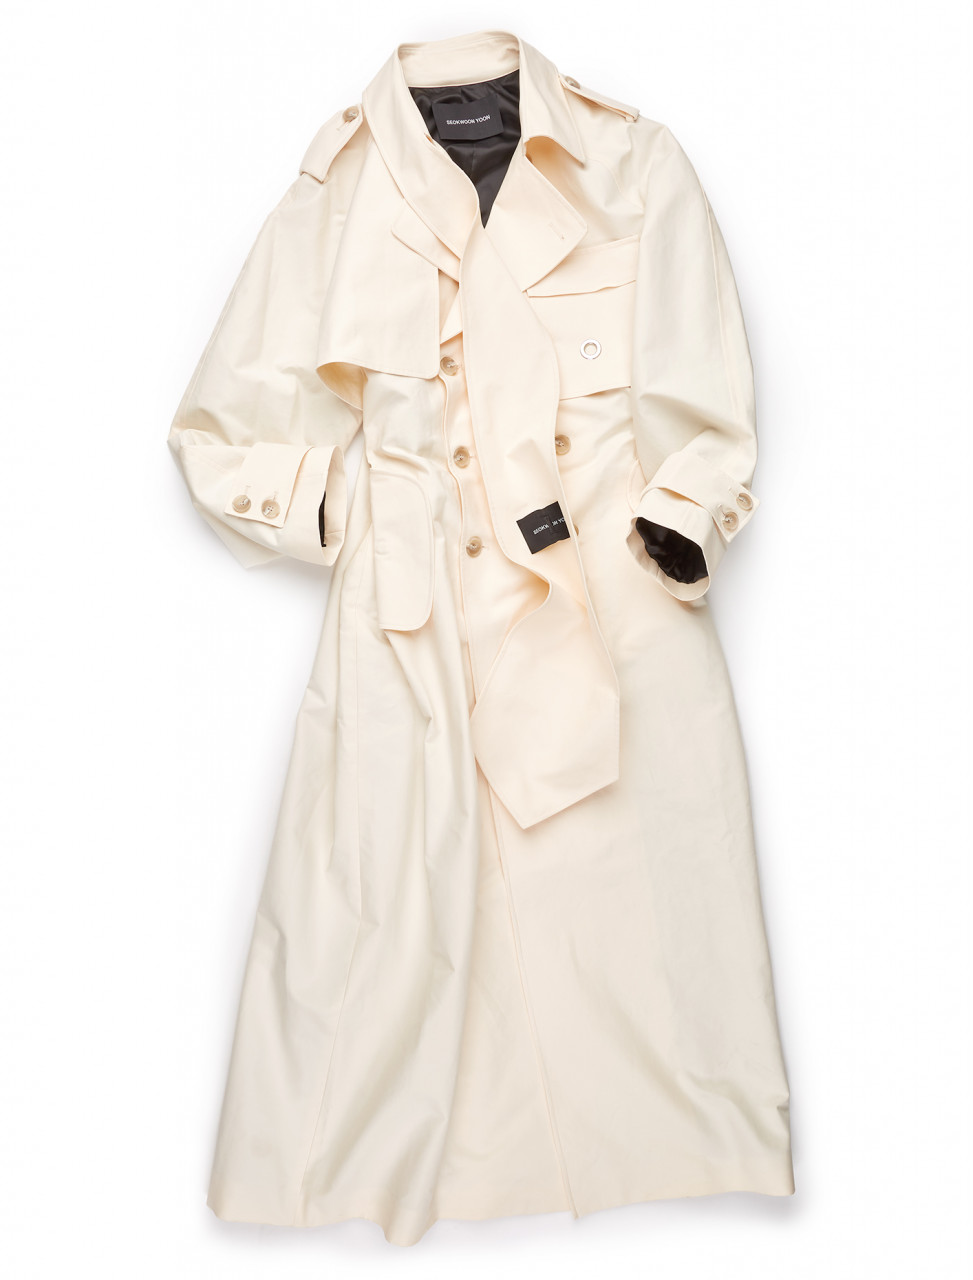 351-SWAW20-006 SEOKWOON YOON CREAM BIG TIE TRENCH COAT CREAM